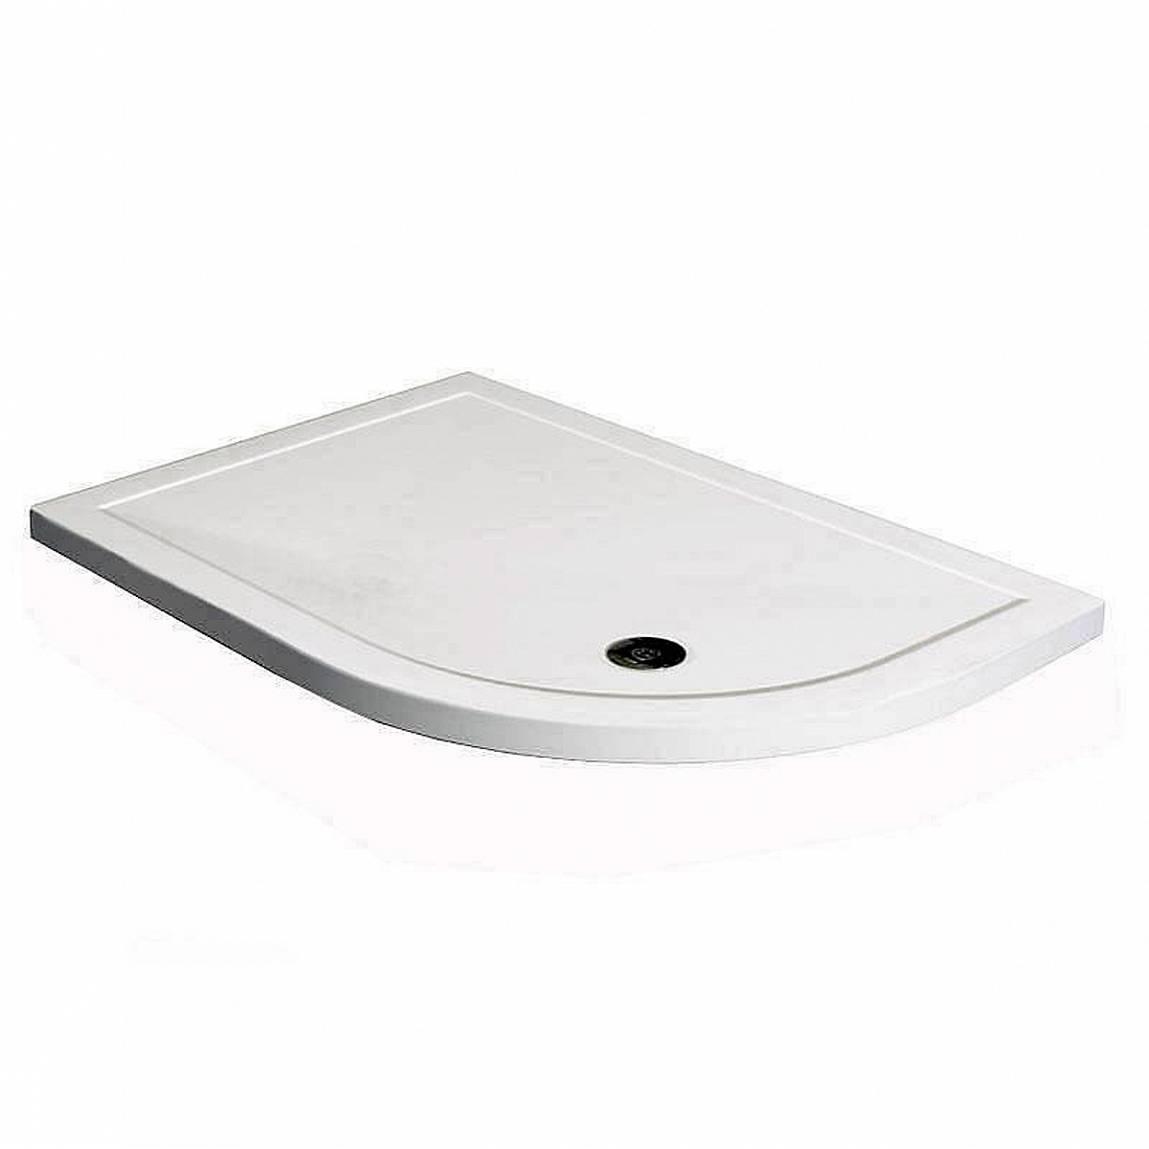 Image of Offset Quadrant Stone Shower Tray 1200 x 900 RH